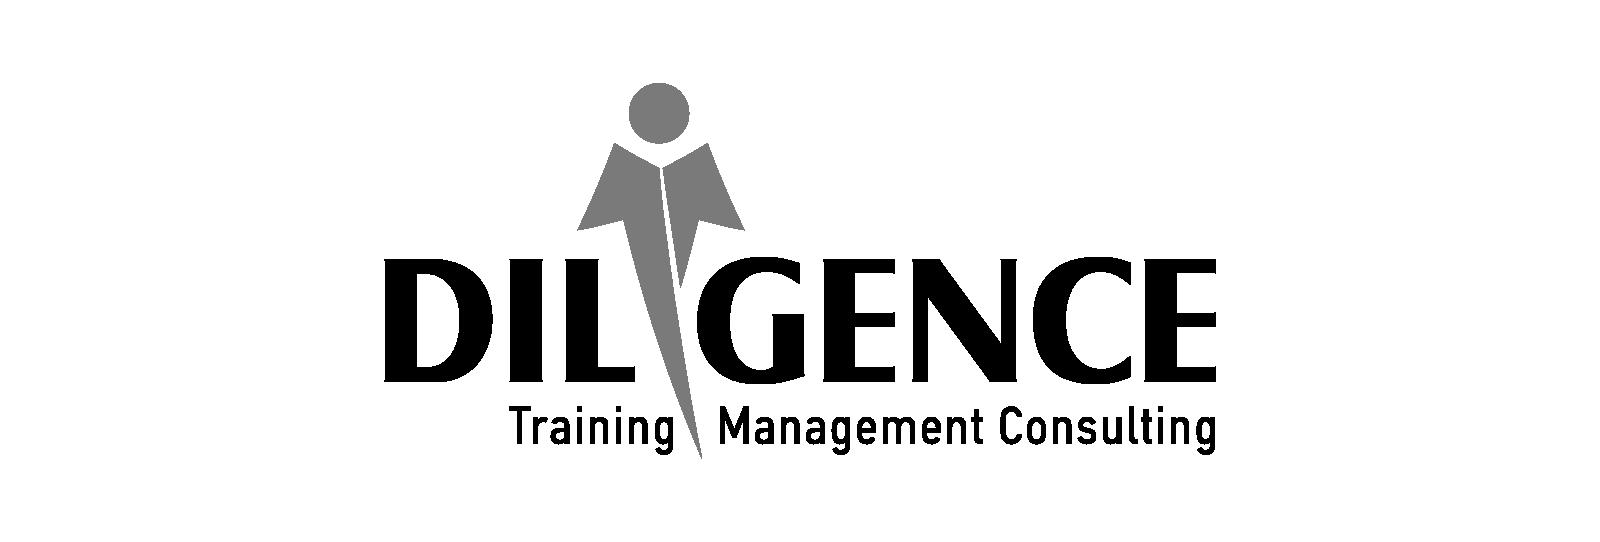 Brandlicious Client 18